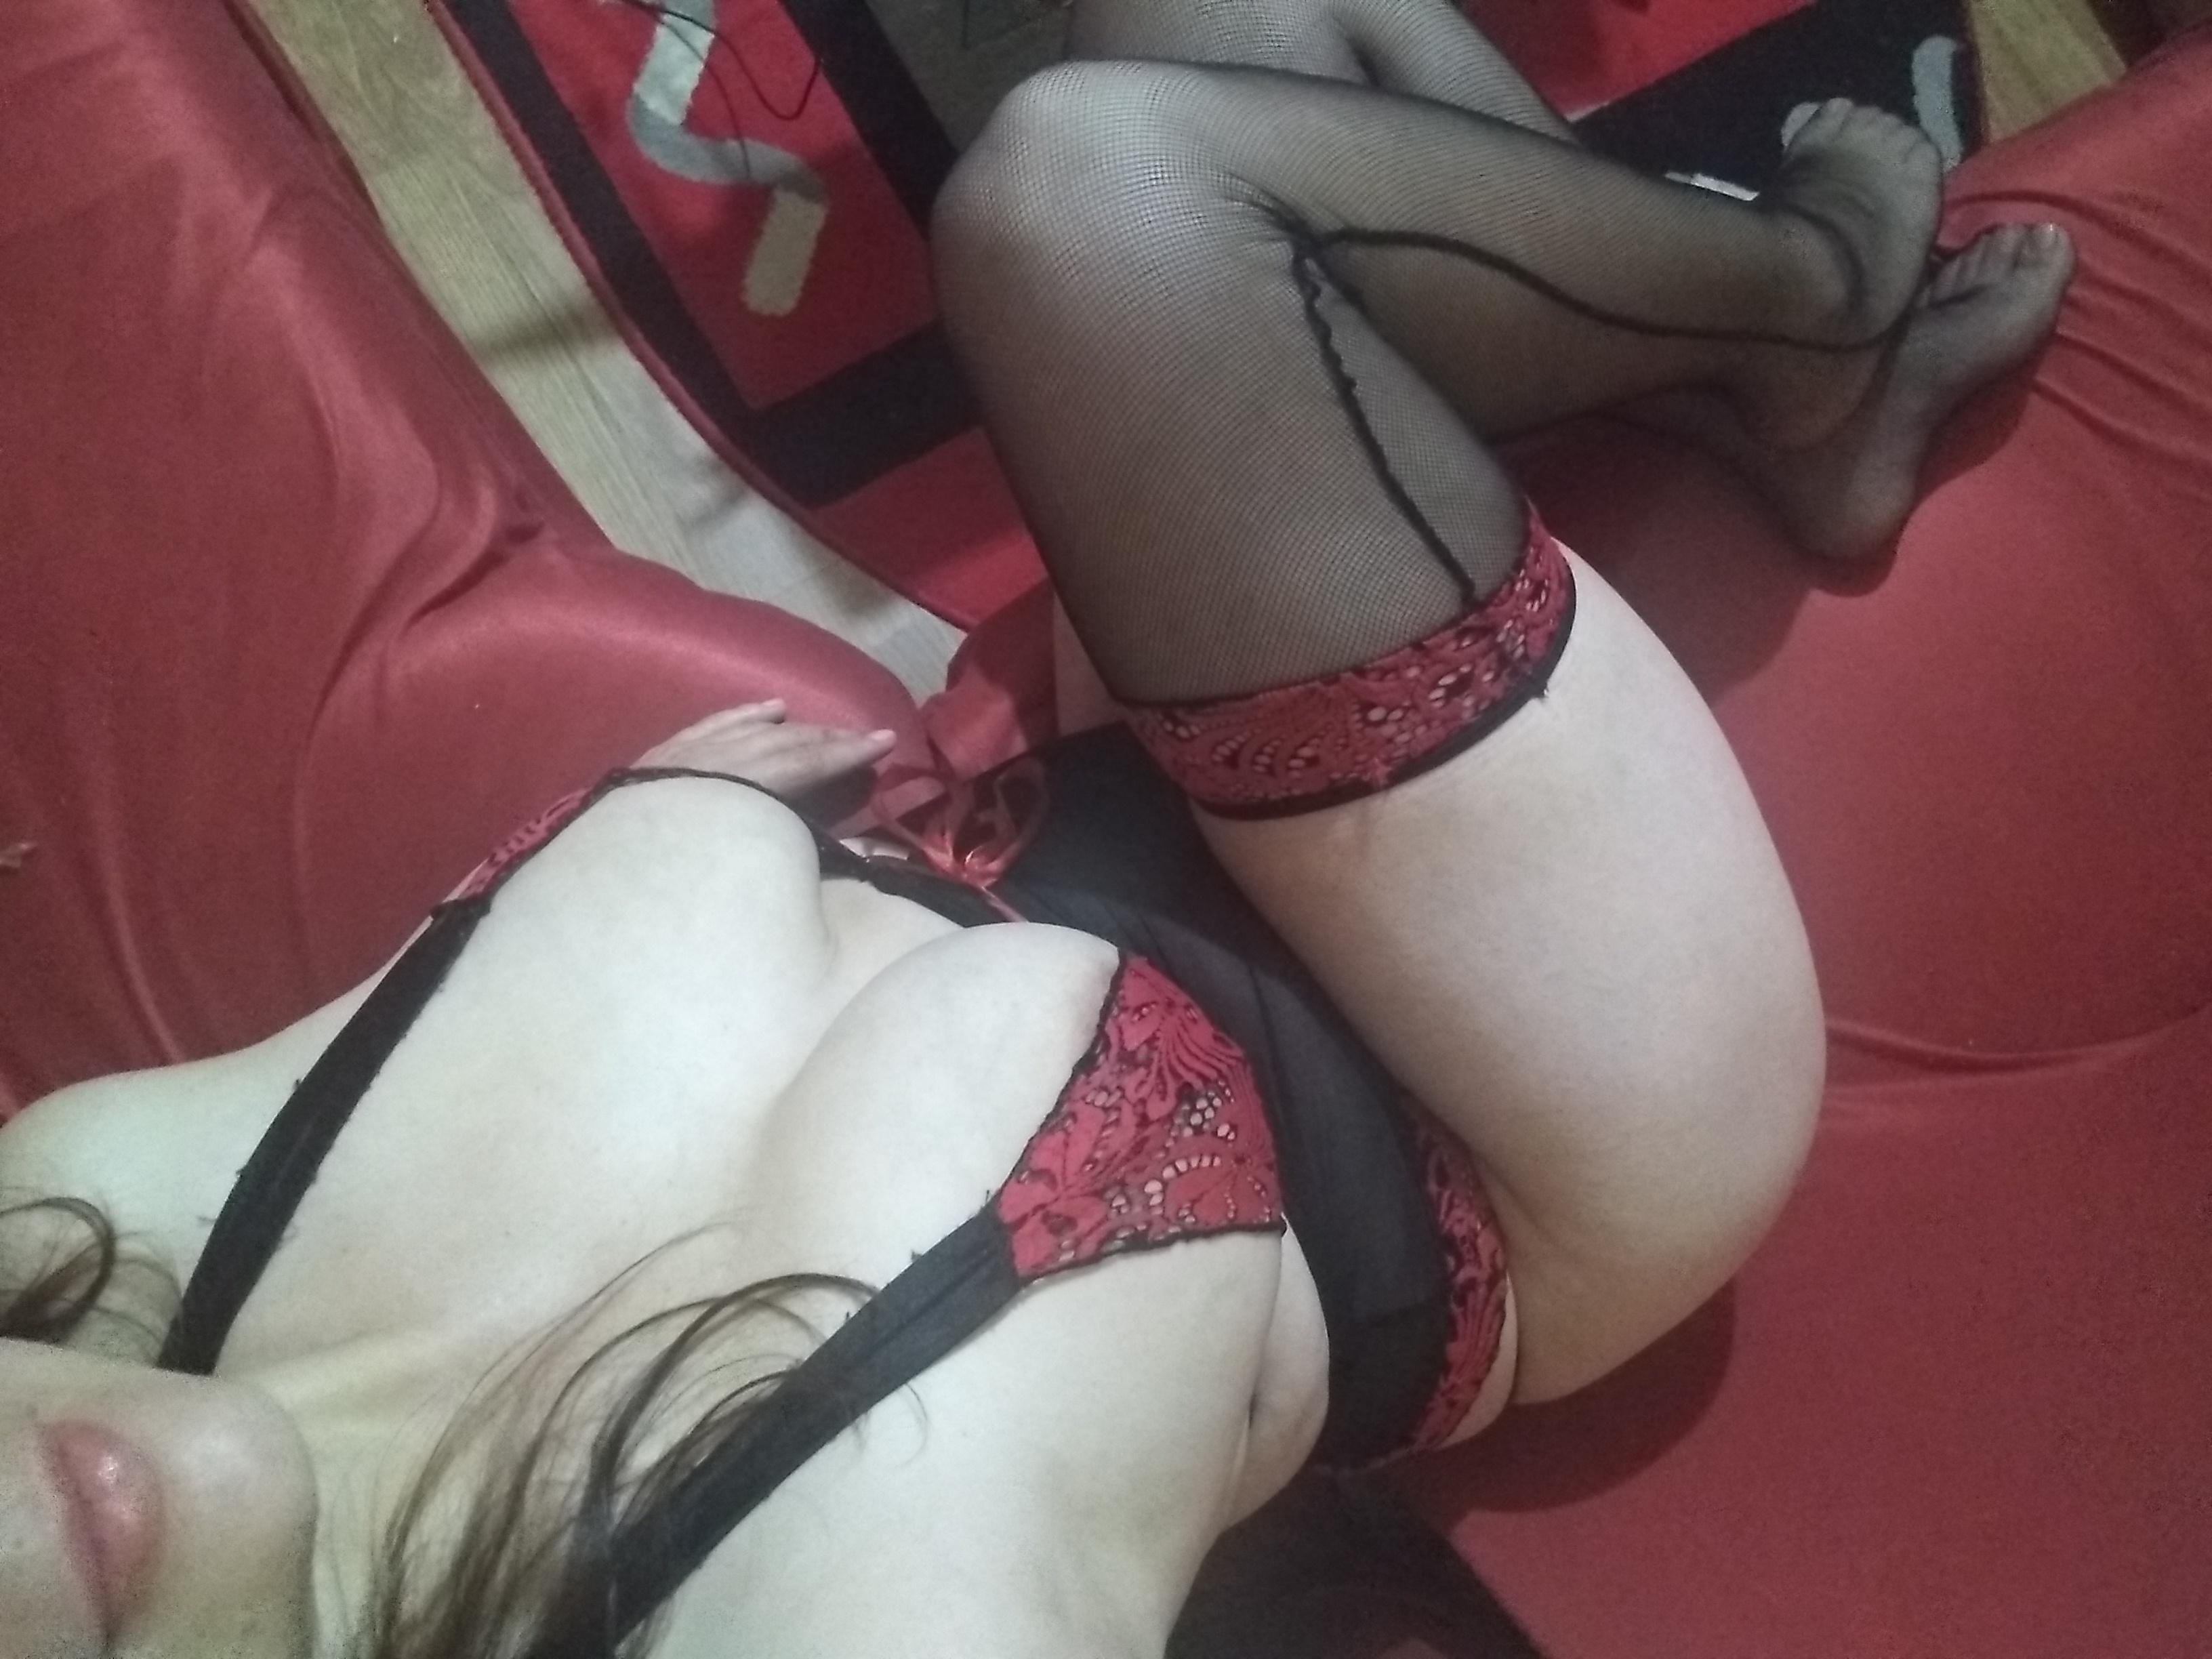 Olivia sexy7?s=xmijmlqsniqmqjuqz6srcn4b9u5asbeoydsbosuwzdm=